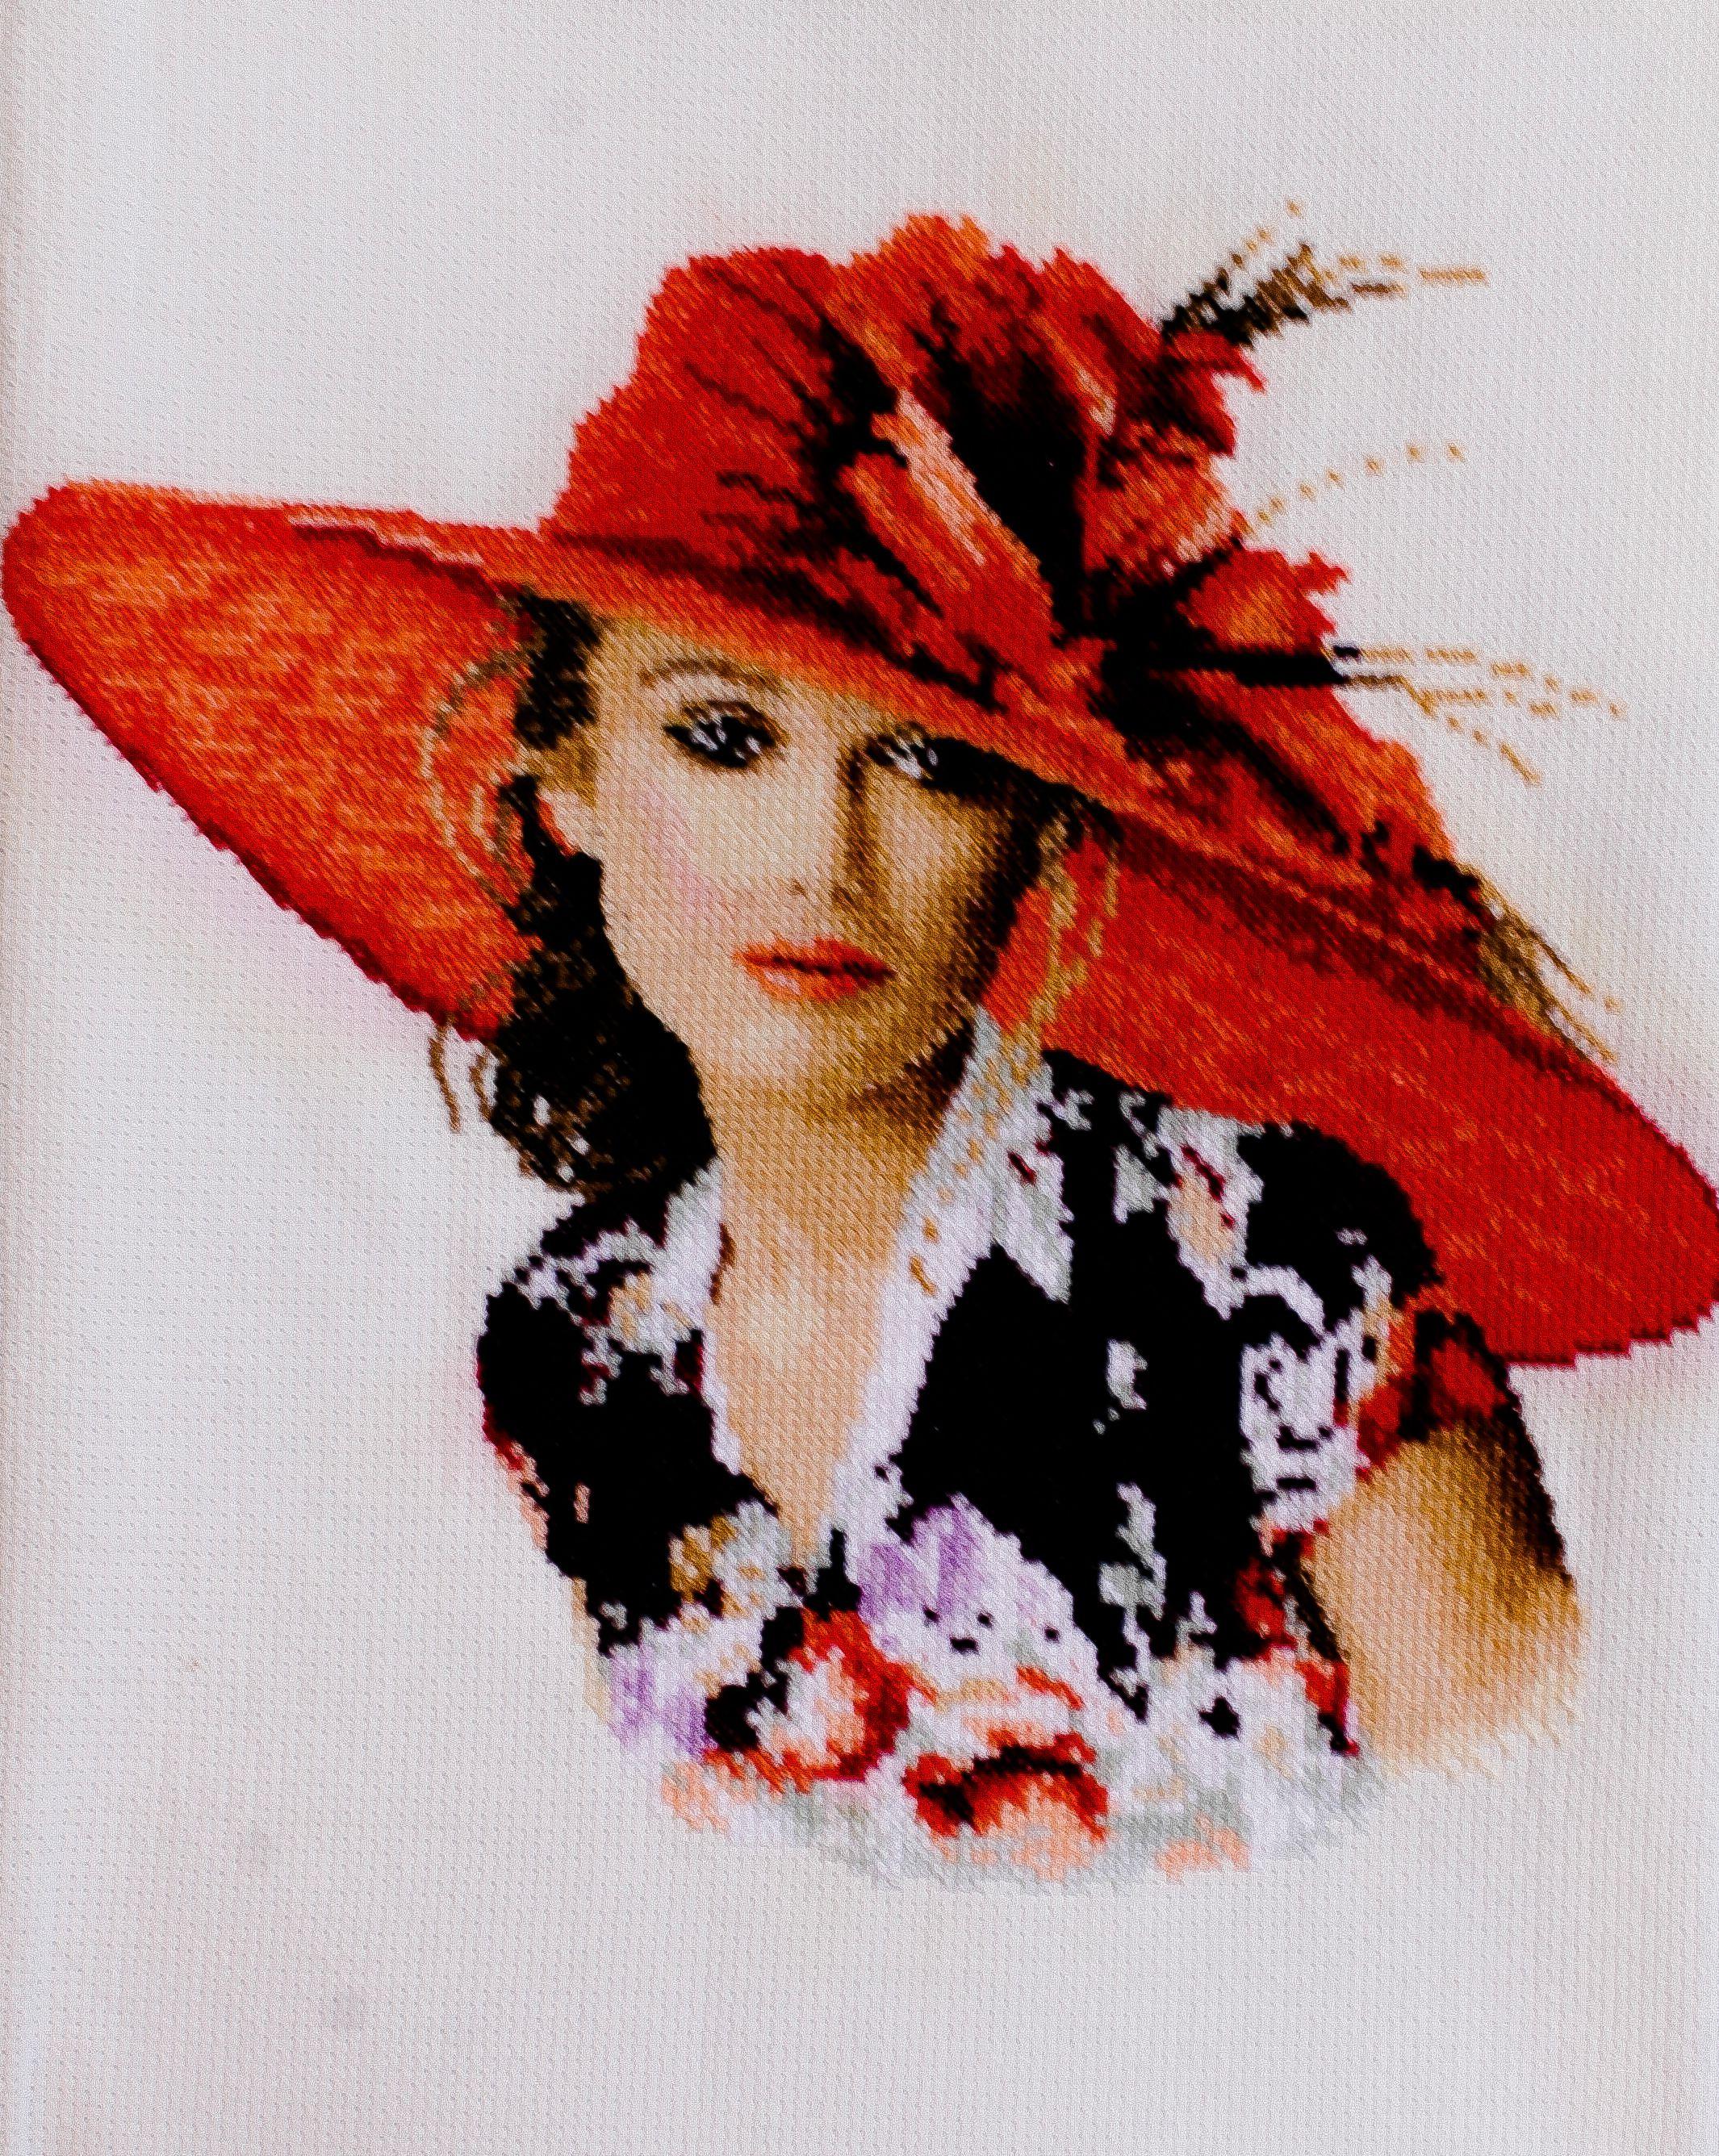 embroidery red картину купить картина подарок вышитую https cross stitch девушке шляпе girl www livemaster item 28595613 kartiny panno vyshivka devushka shlyape viktoriya art девушка красный вышивка ярко